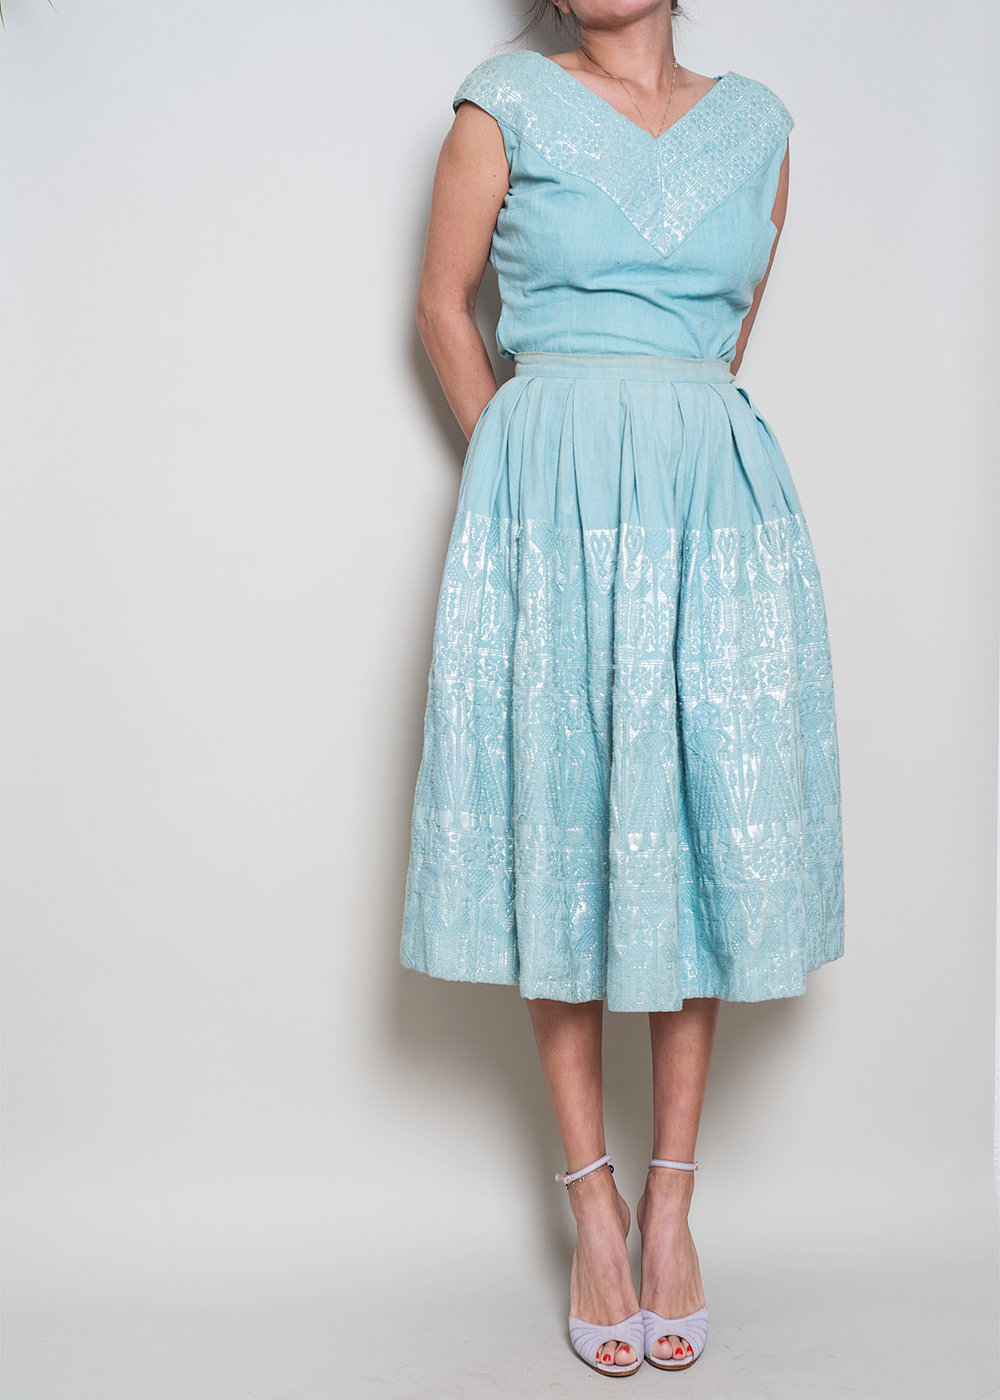 A_Part_of_the_Rest_Vintage_1950s_Guatemalan_Lurex_Woven_Textured_Midi_Skirt_Top_Set_009.jpg